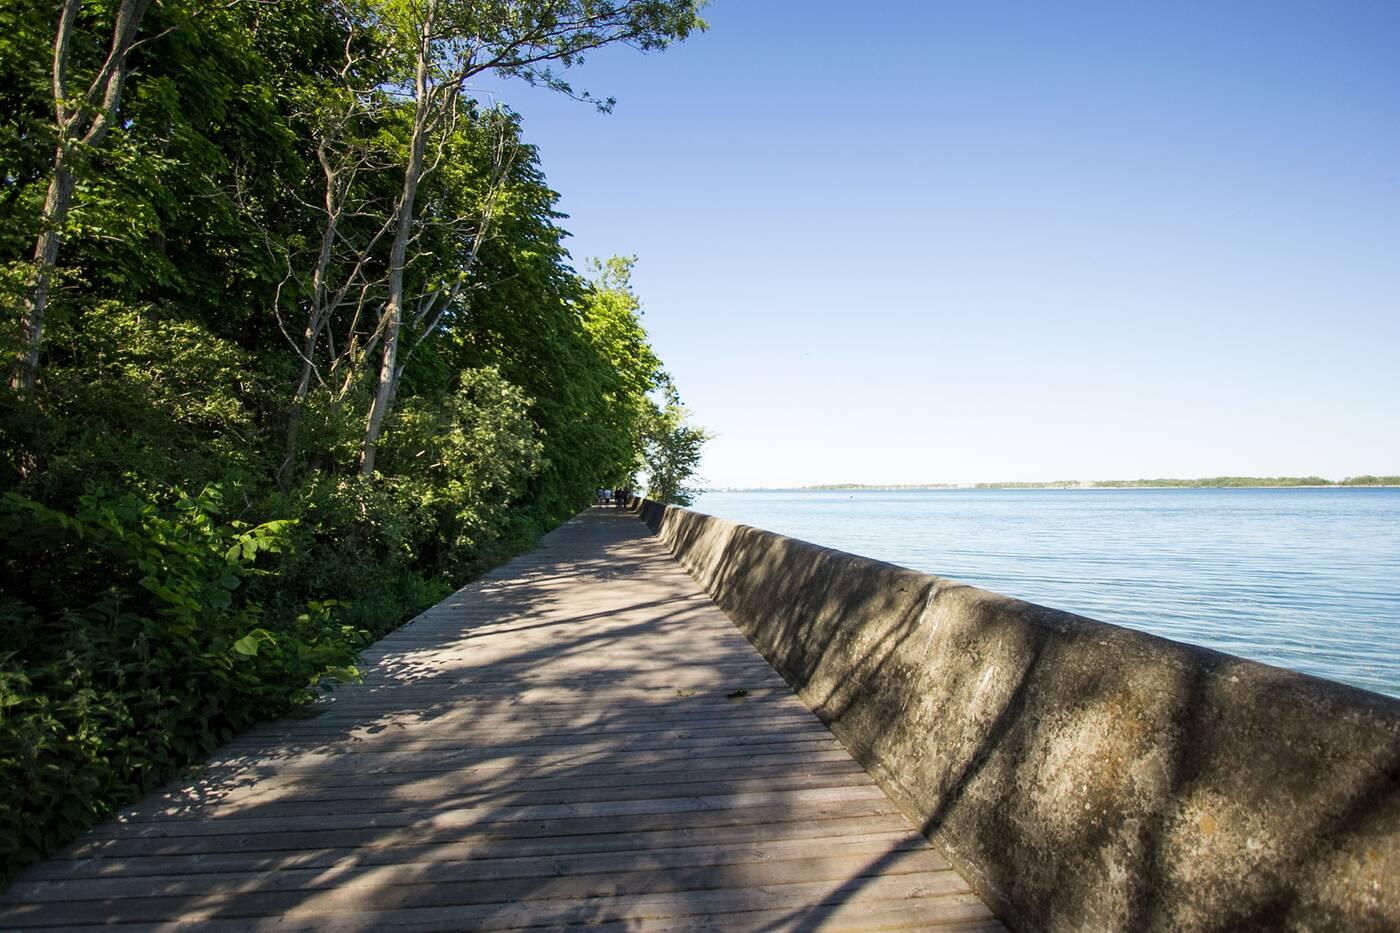 toronto island to do